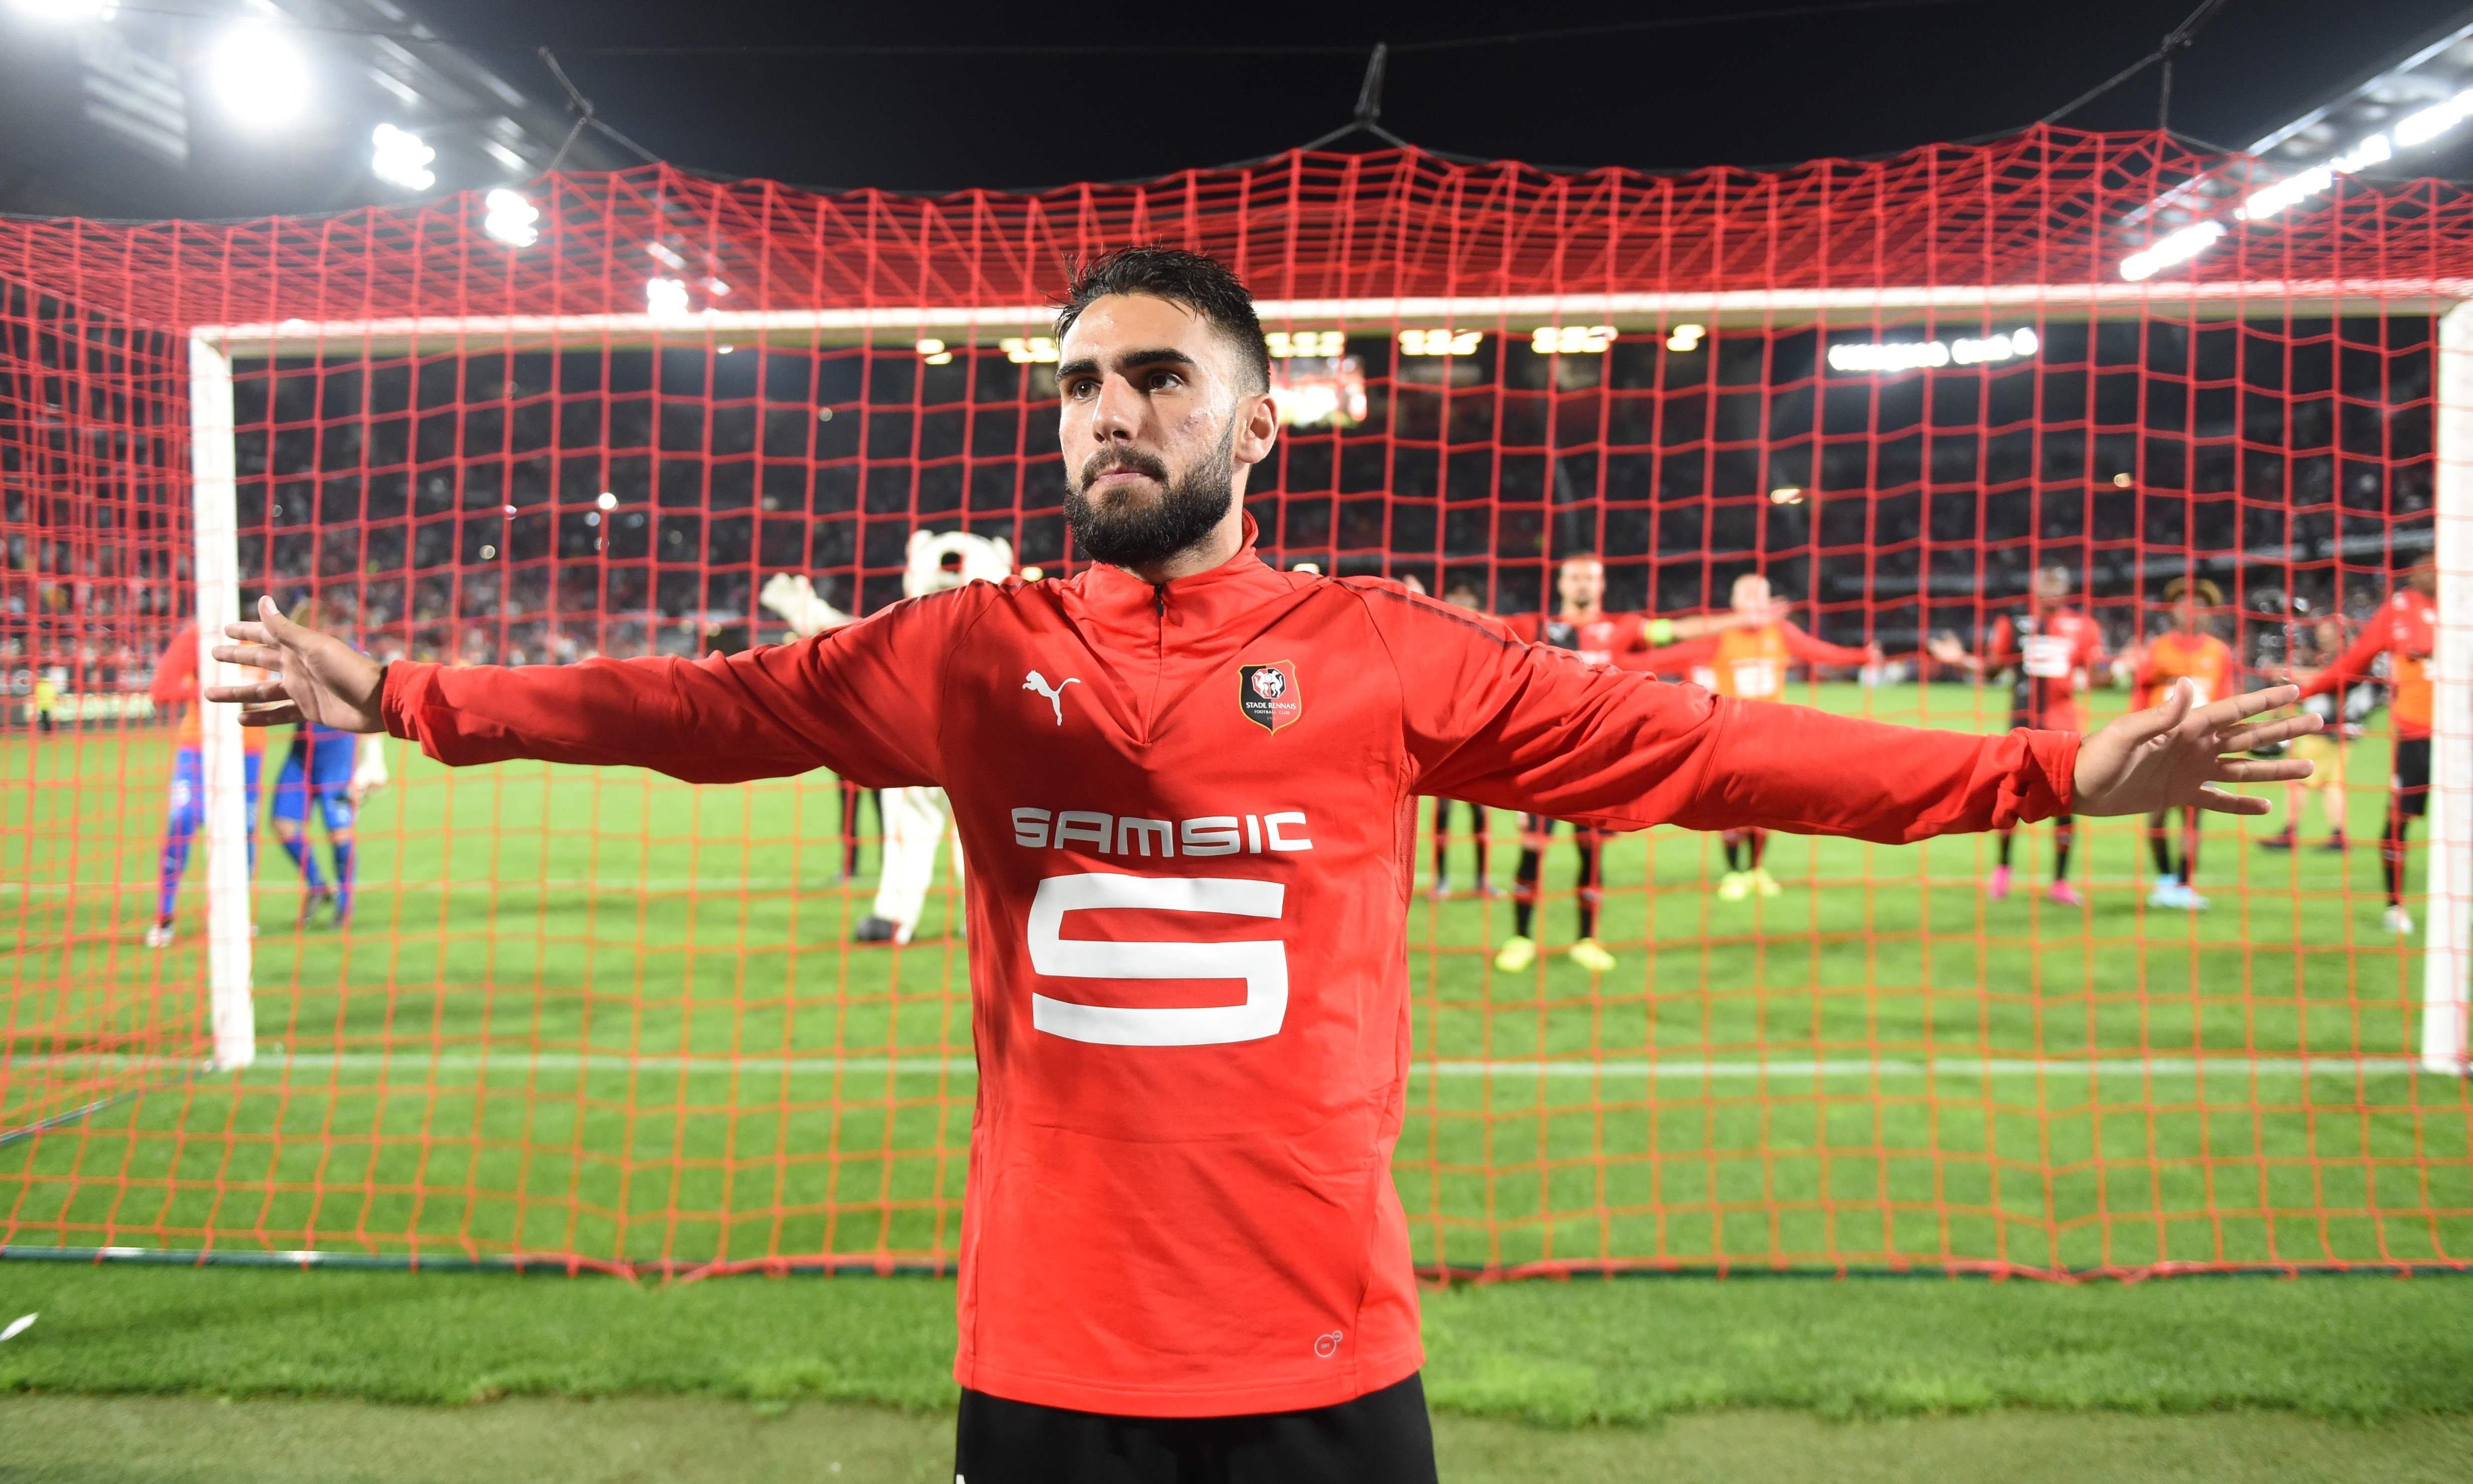 European roundup: Rennes shock PSG, Trippier impresses for Atlético